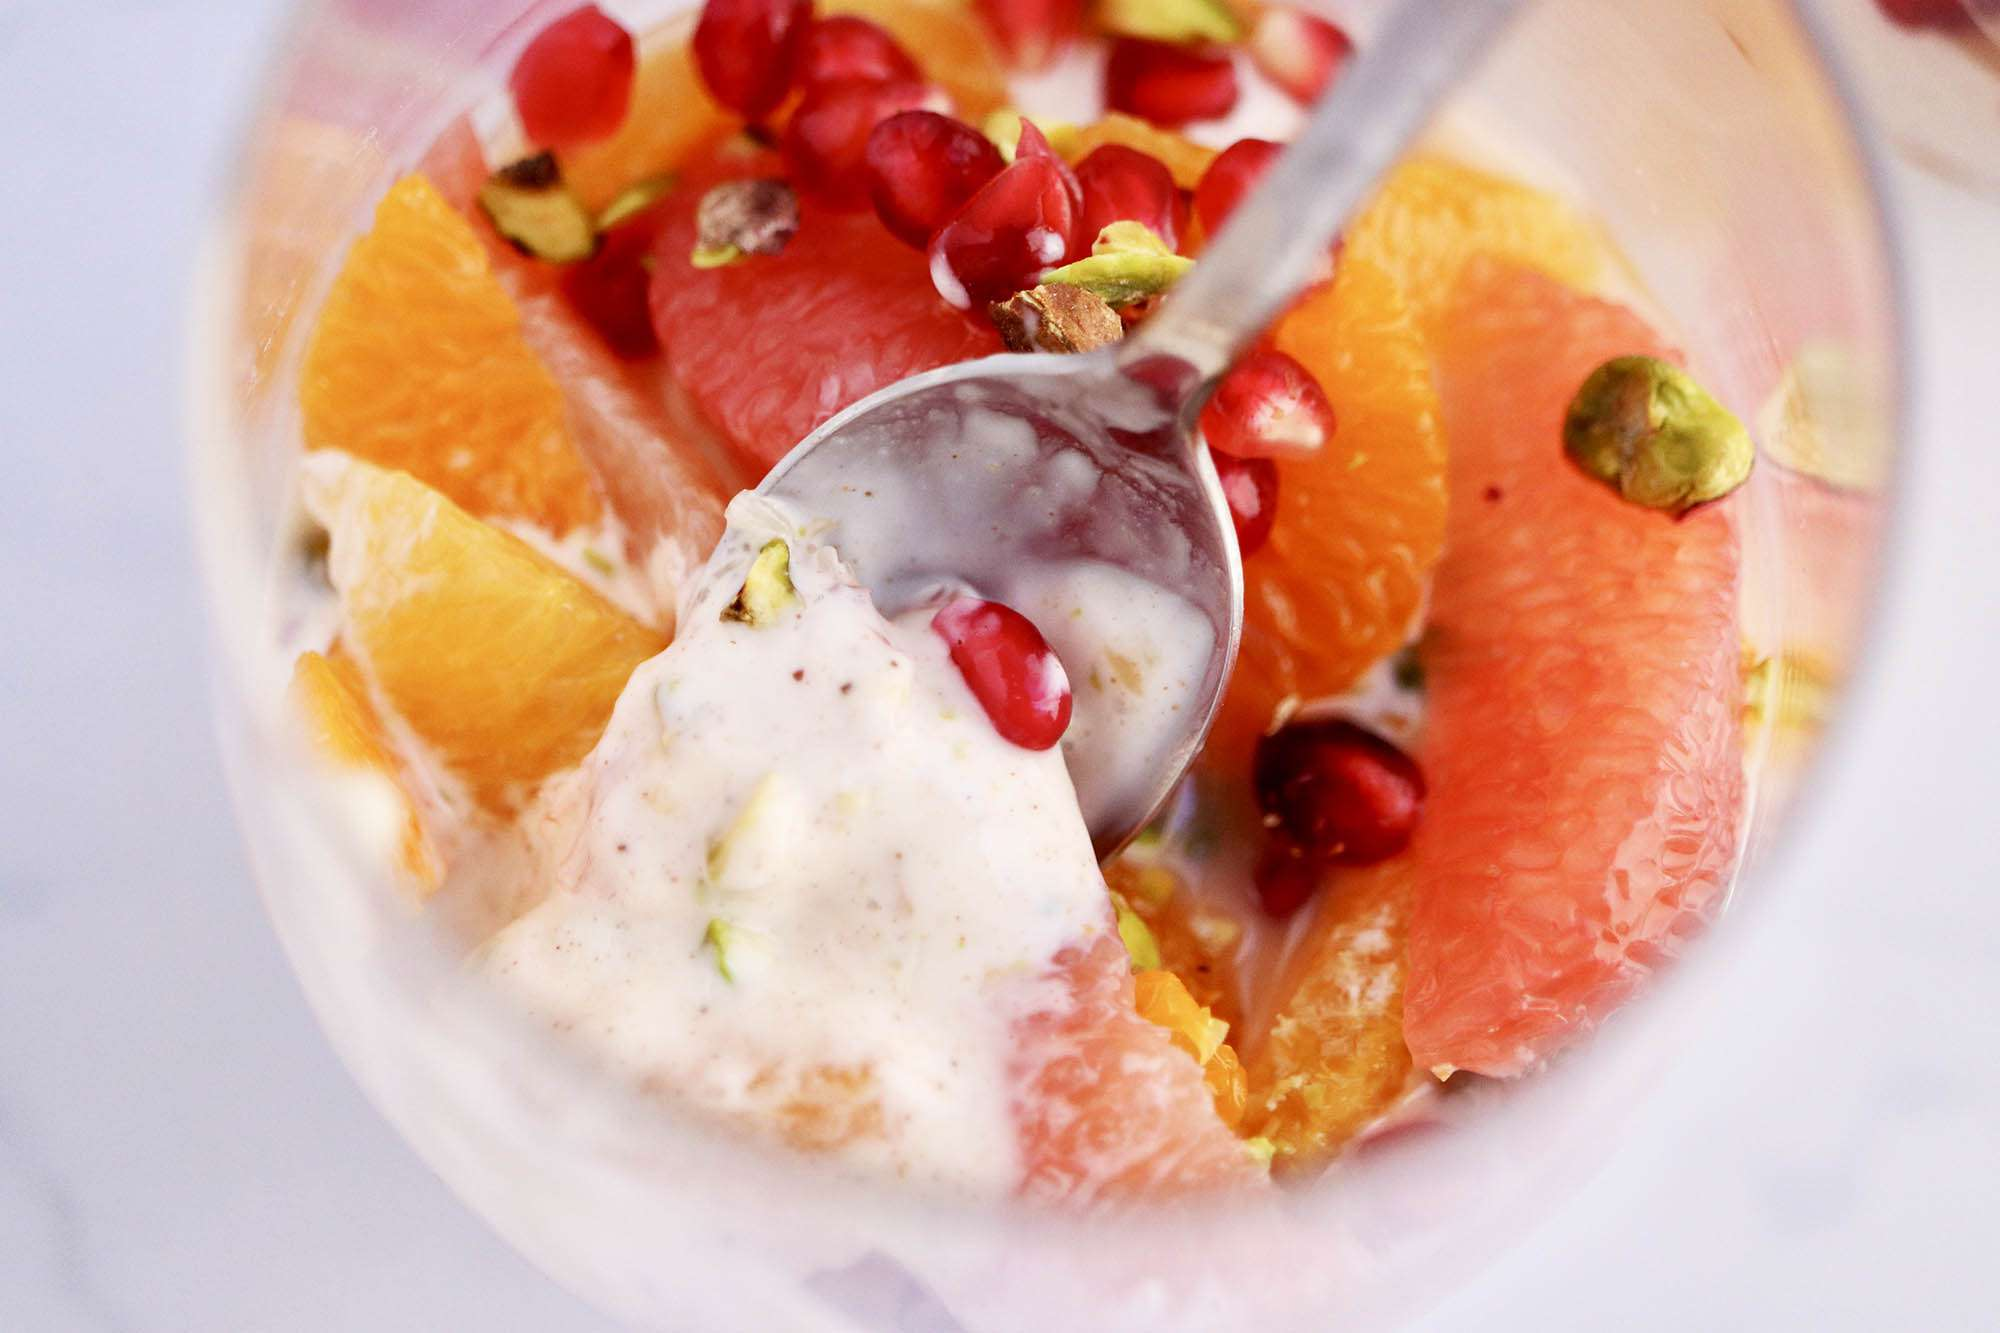 Citrus Parfaits with Grapefruit, Orange and Clementine